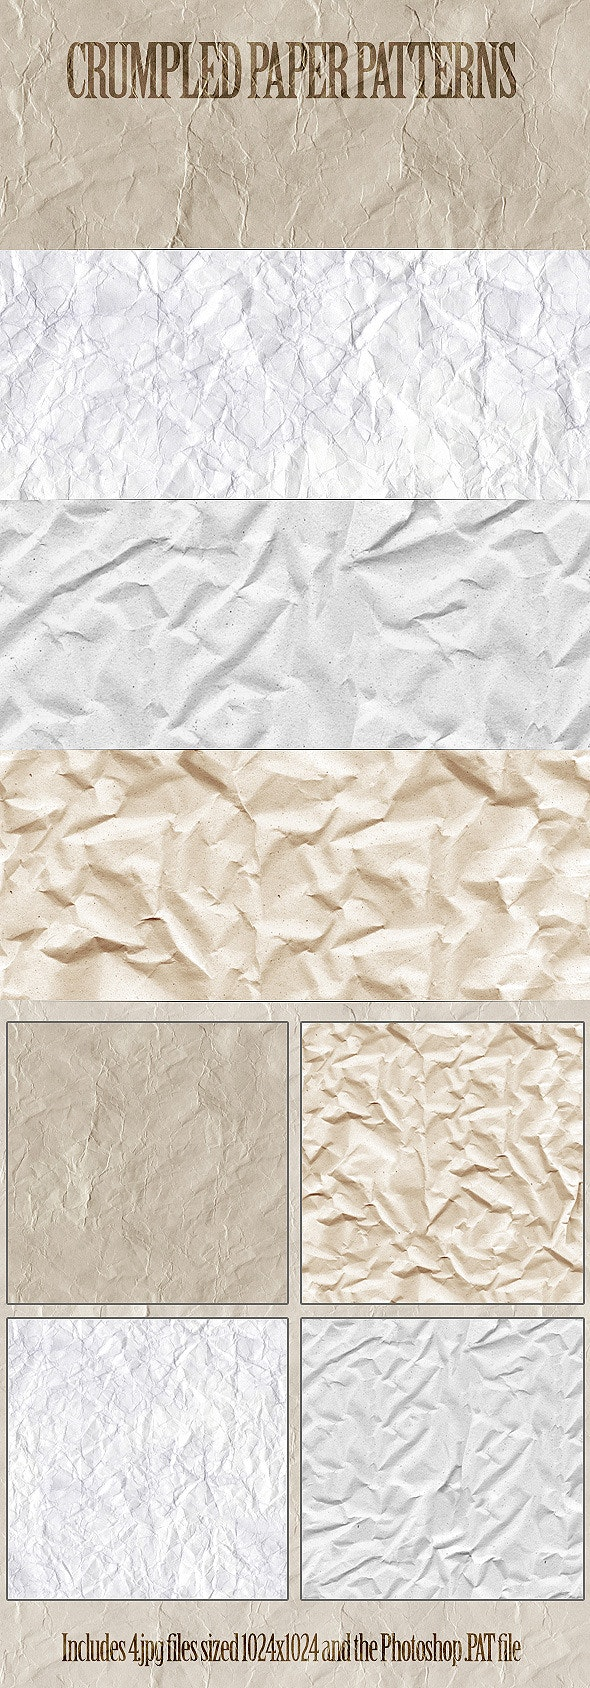 Crumpled Paper Patterns - Artistic Textures / Fills / Patterns